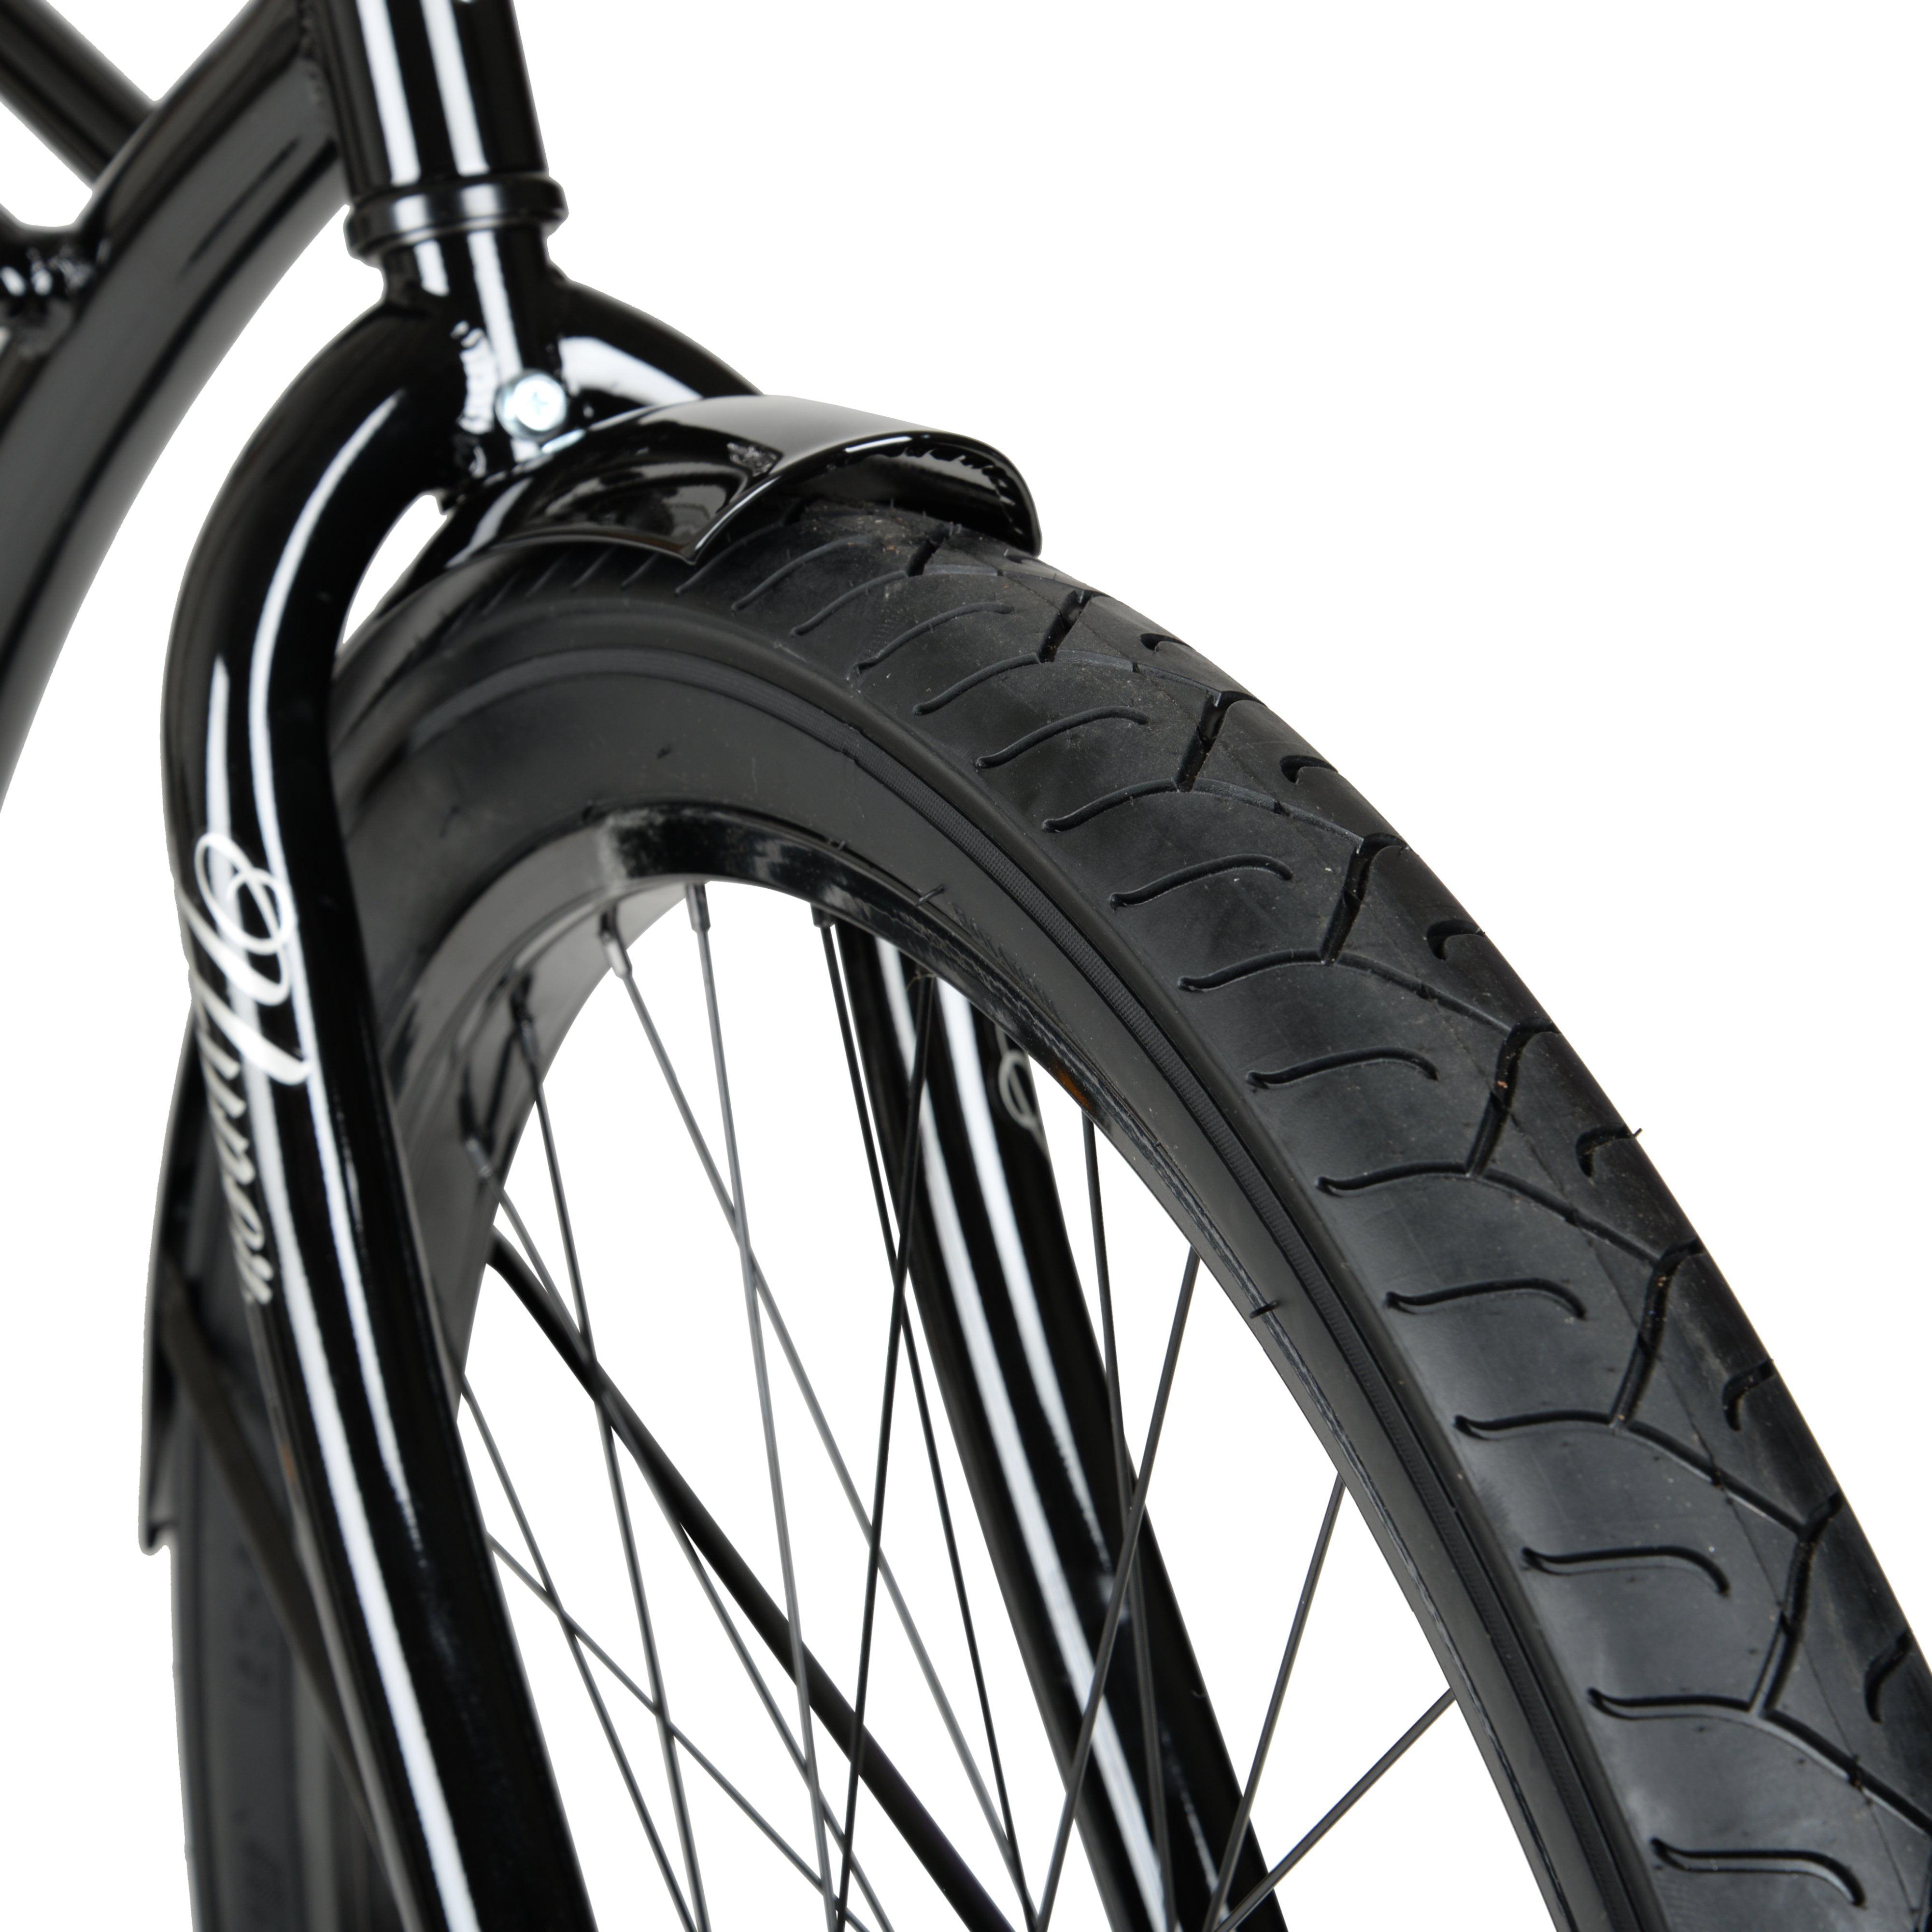 5x Bicycle Chainwheel Screws CNC 7075 Chainring Wheel Bolt Bike Disc ScRGS